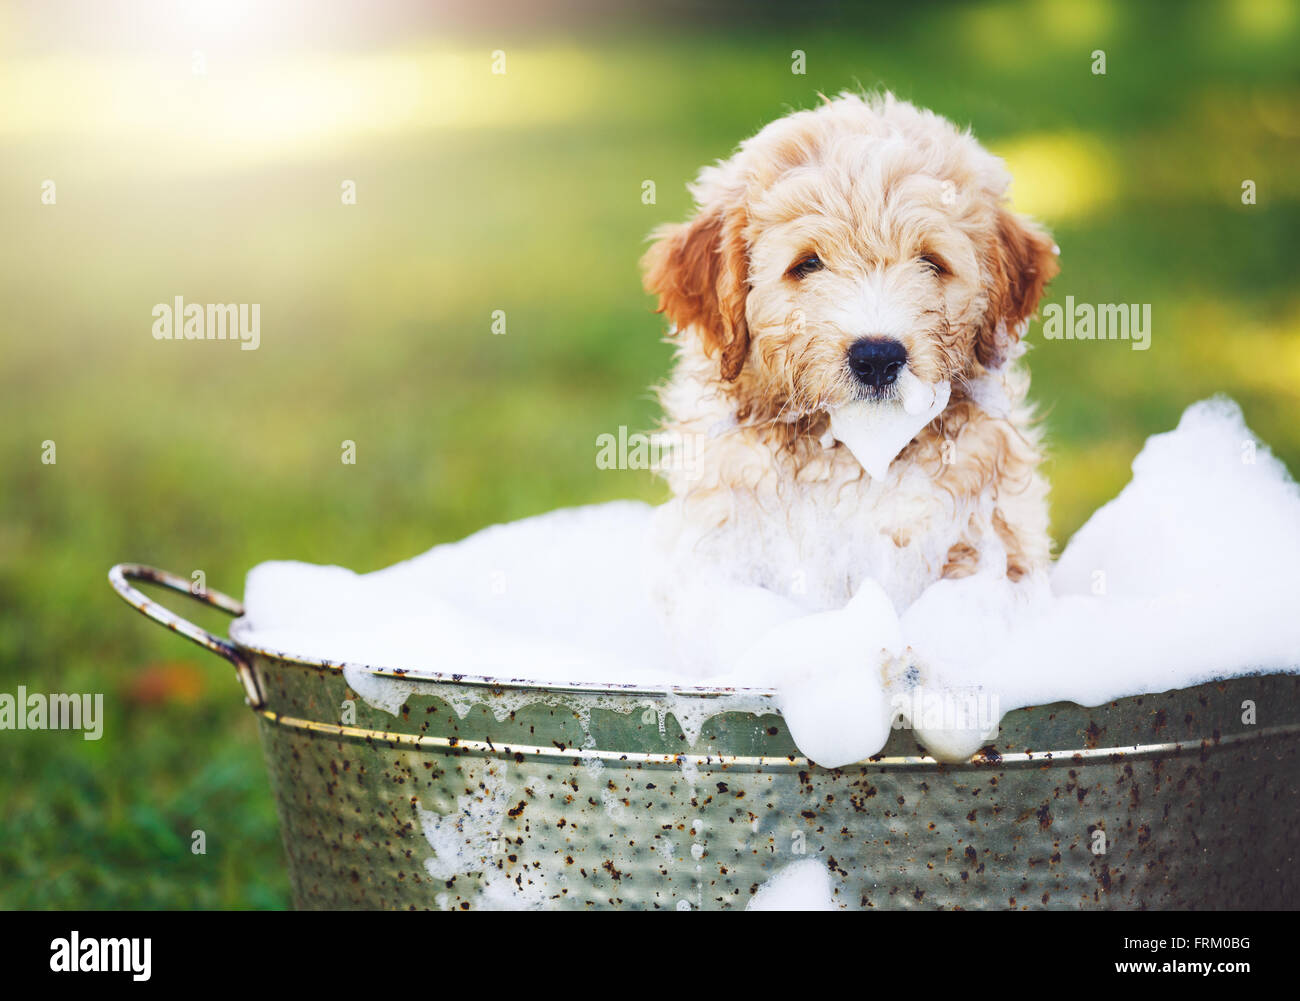 Adorable Cute Puppy Golden Retriever Puppy Taking A